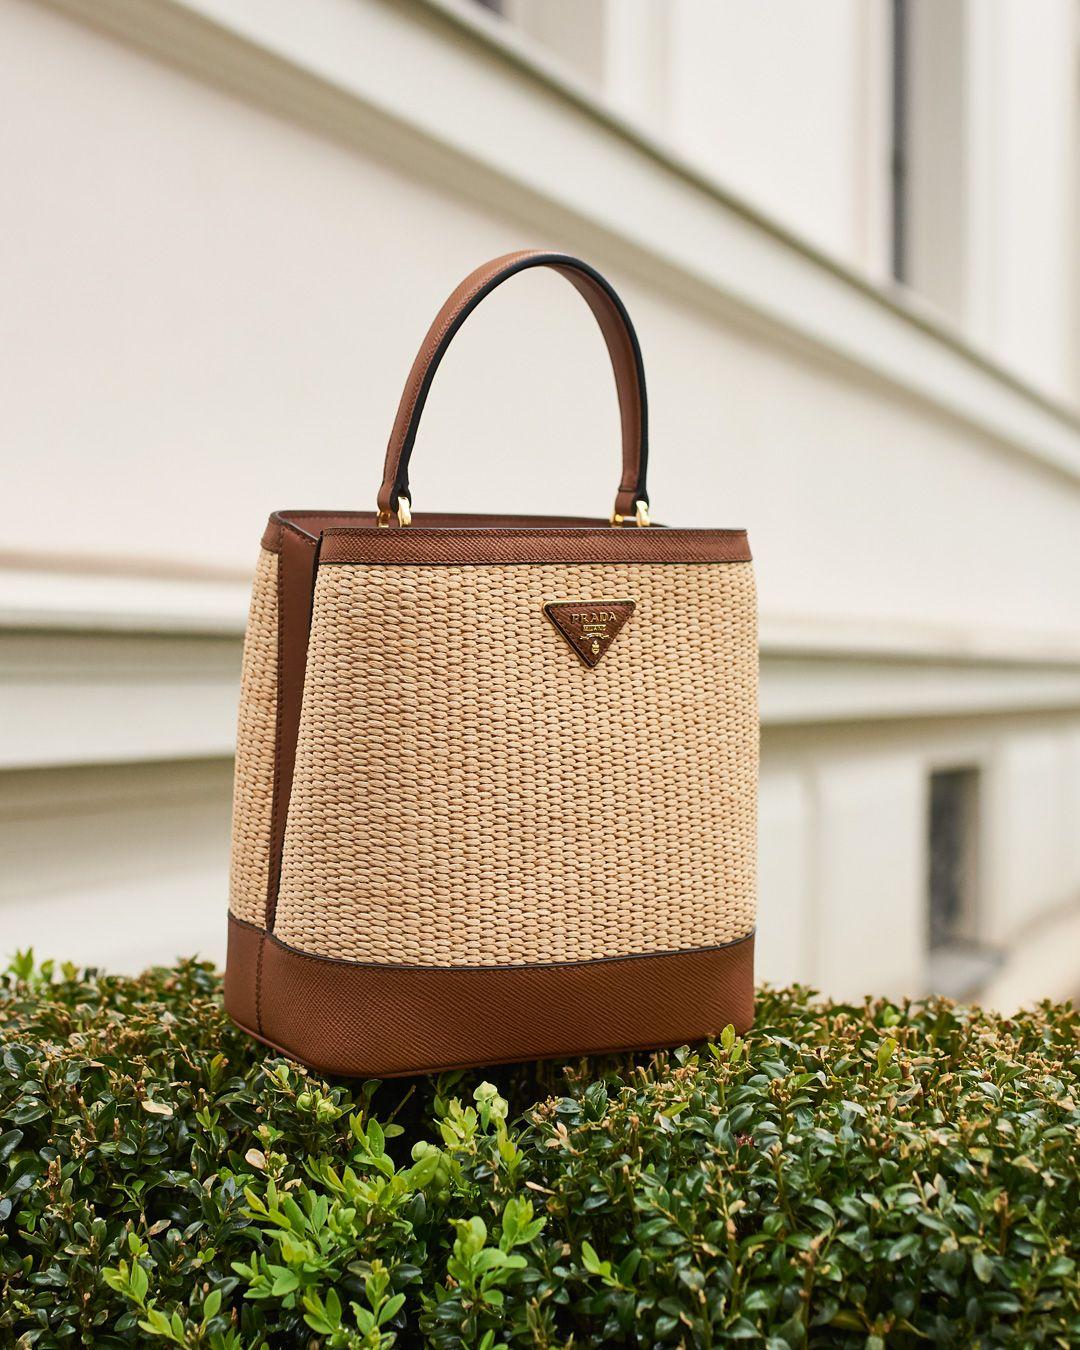 738c58deaec4 Panier Medium straw shoulder bag in 2019 | Fashion